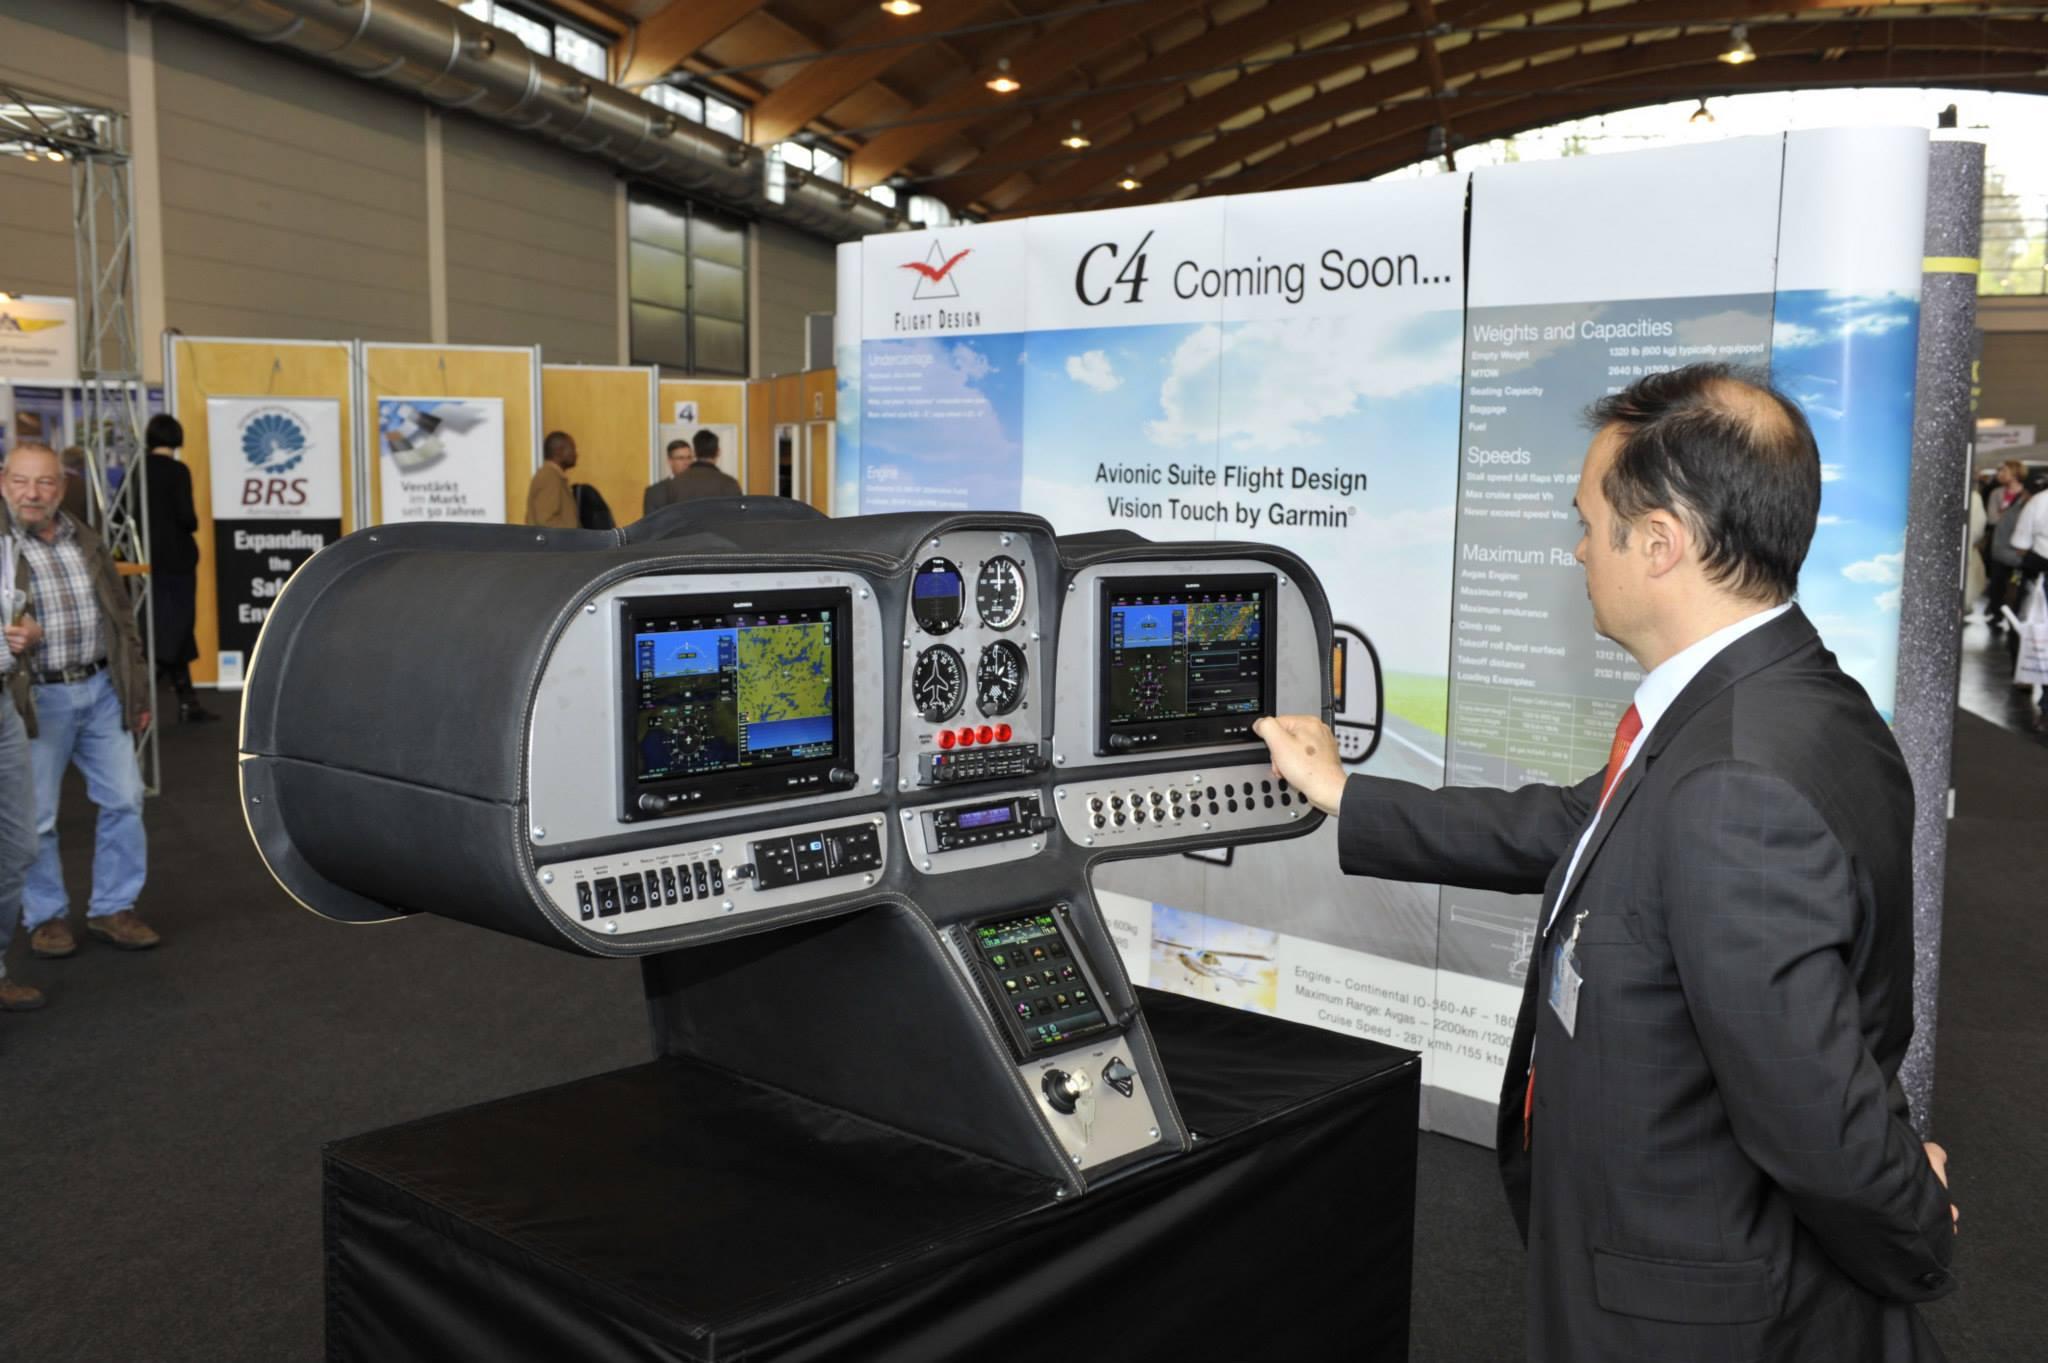 Flight Design C4 gets Garmin avionics - FLYER